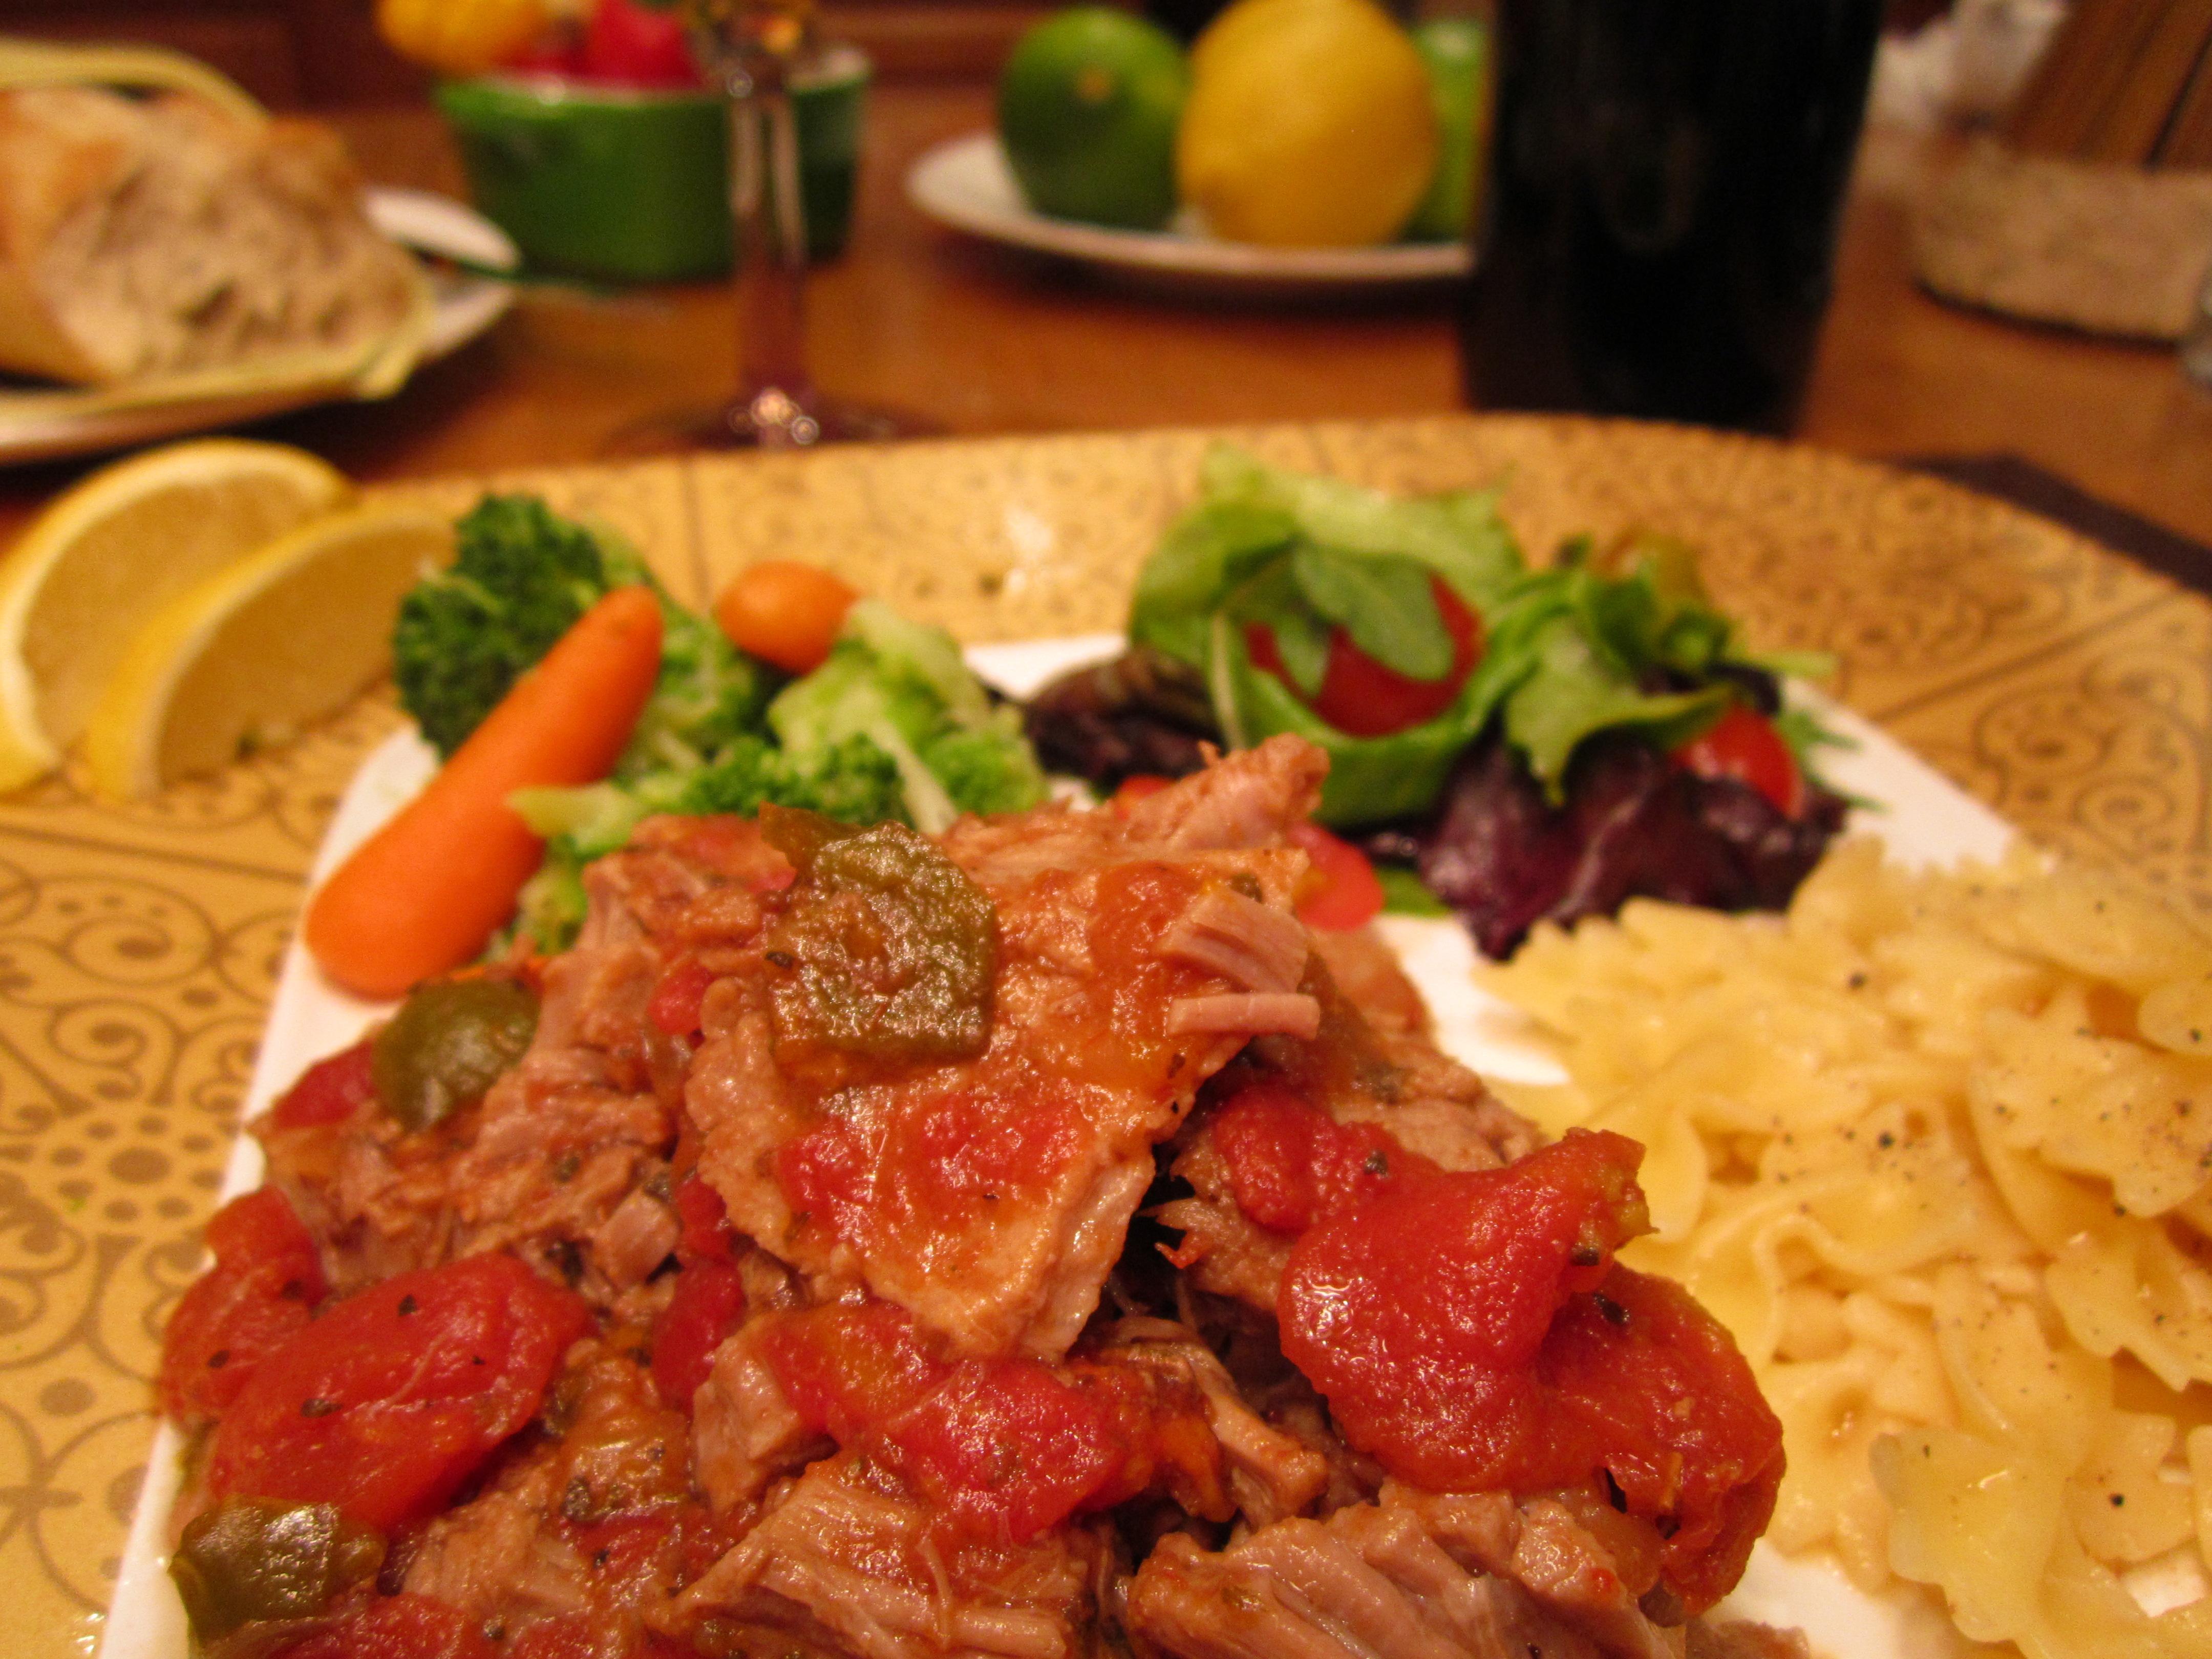 Italian beef entr e jesben for Italian entree recipes